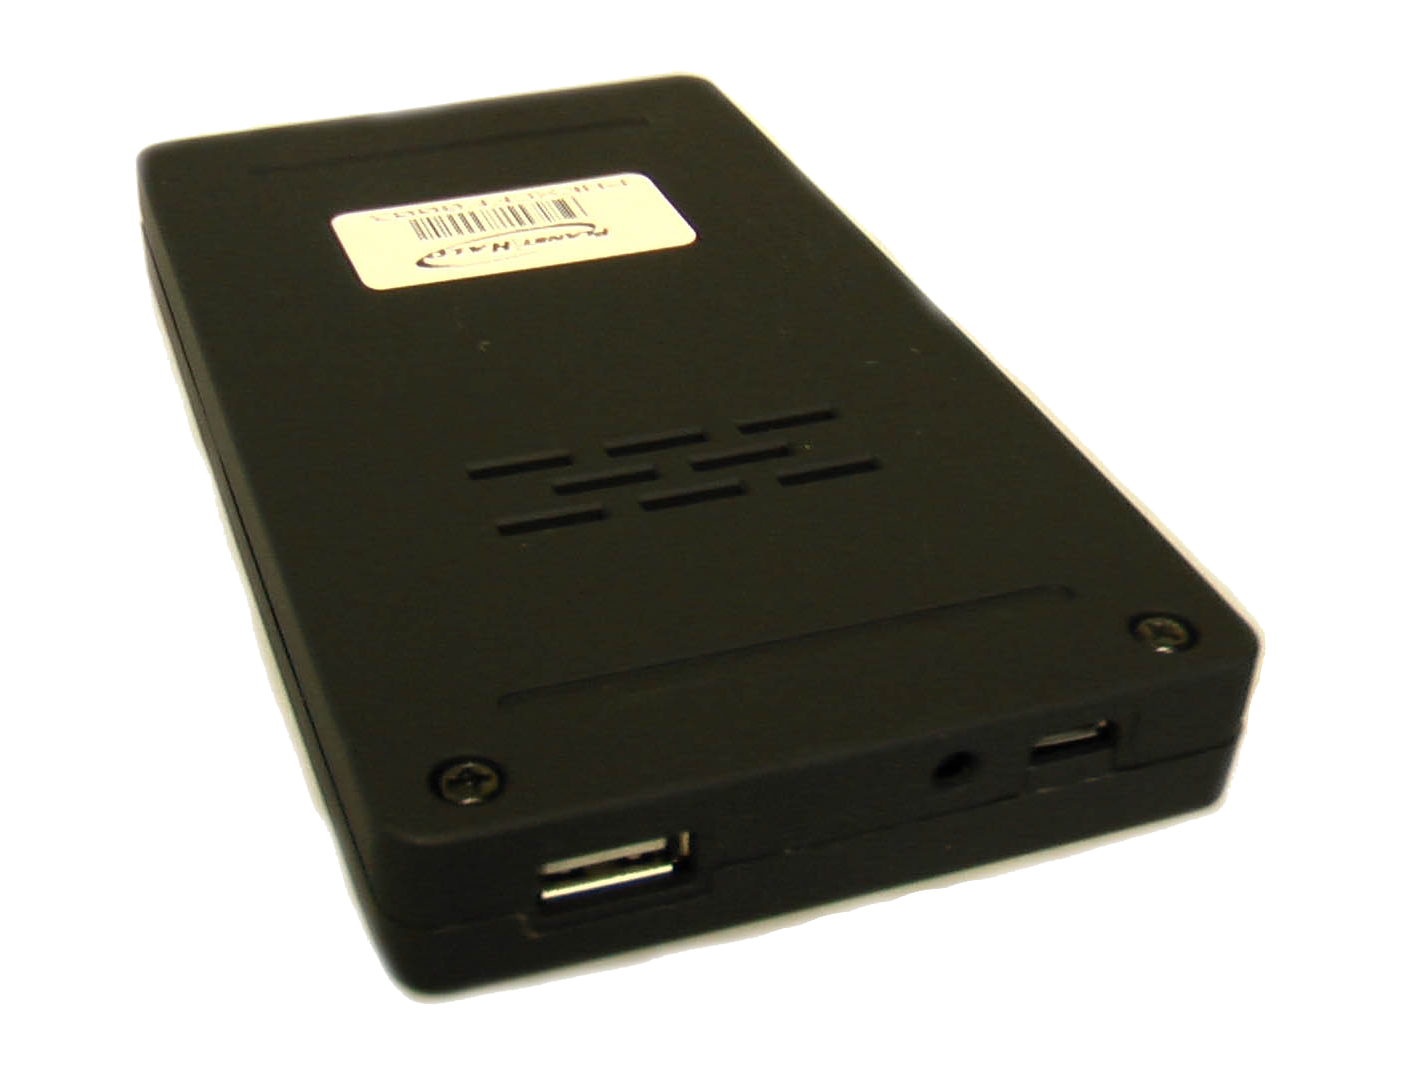 HDDfinal-hard-drive